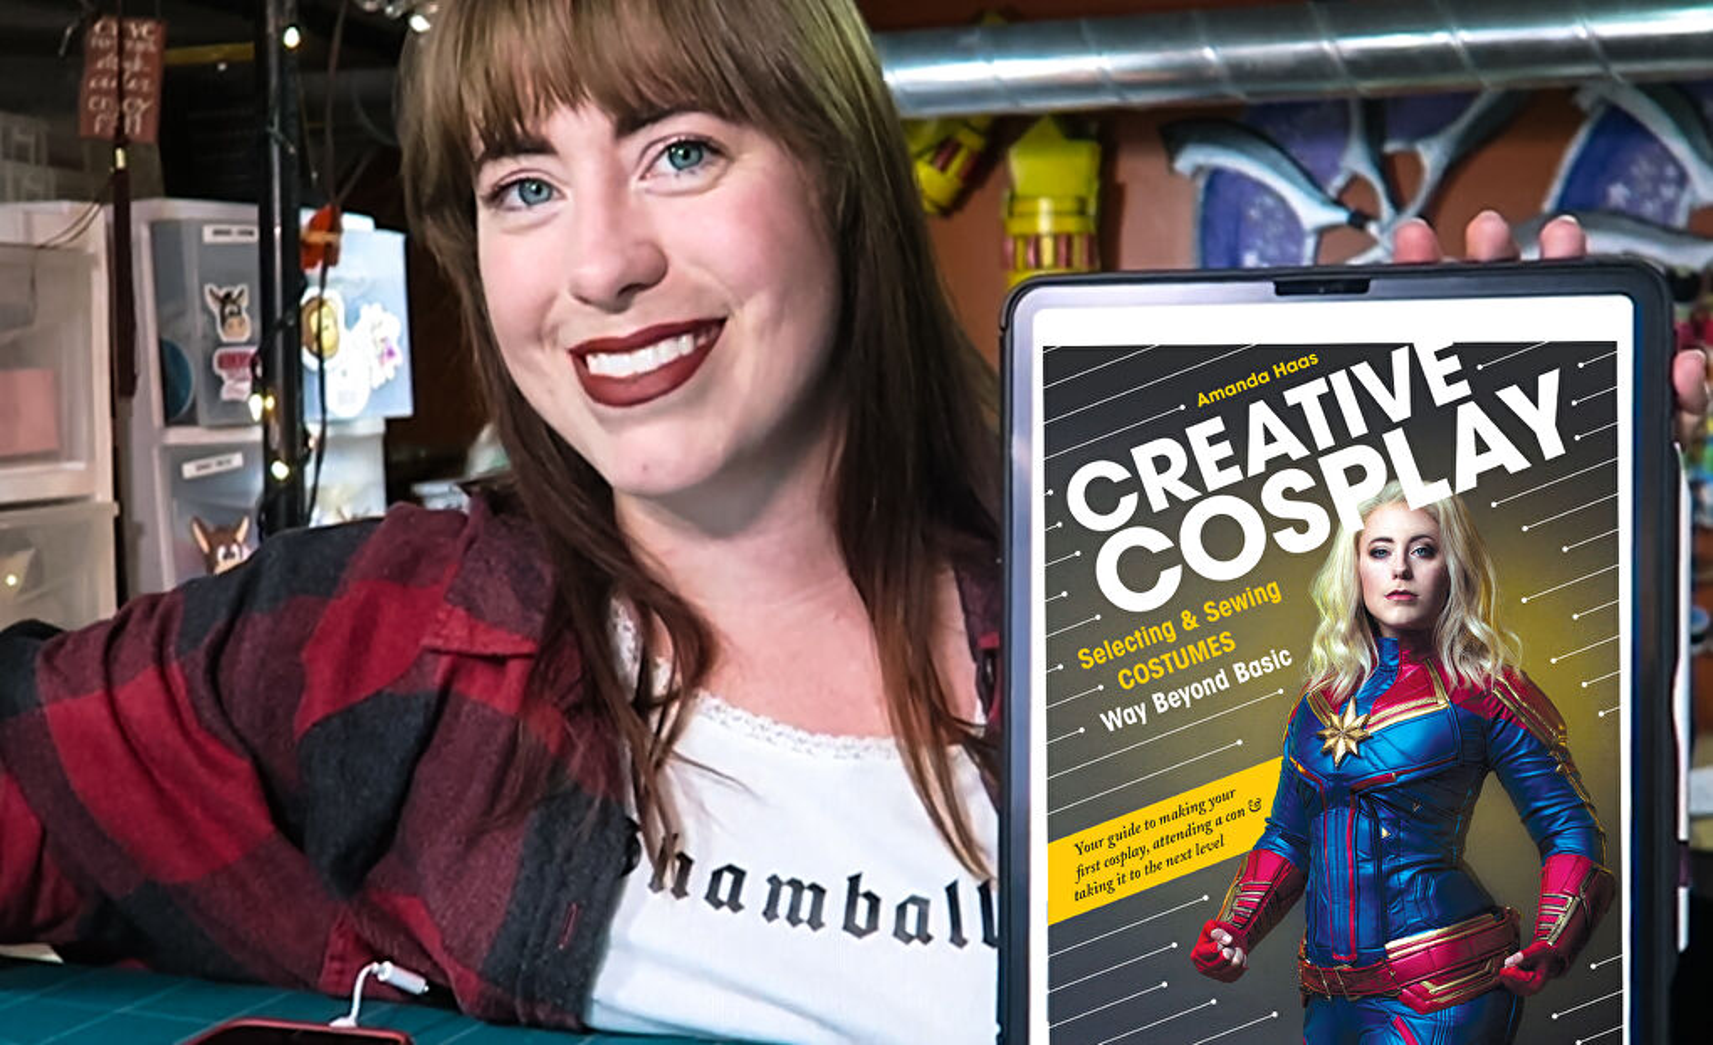 Cosplayer Jedimanda (Amanda Haas) with her new book 'Creative Cosplay'